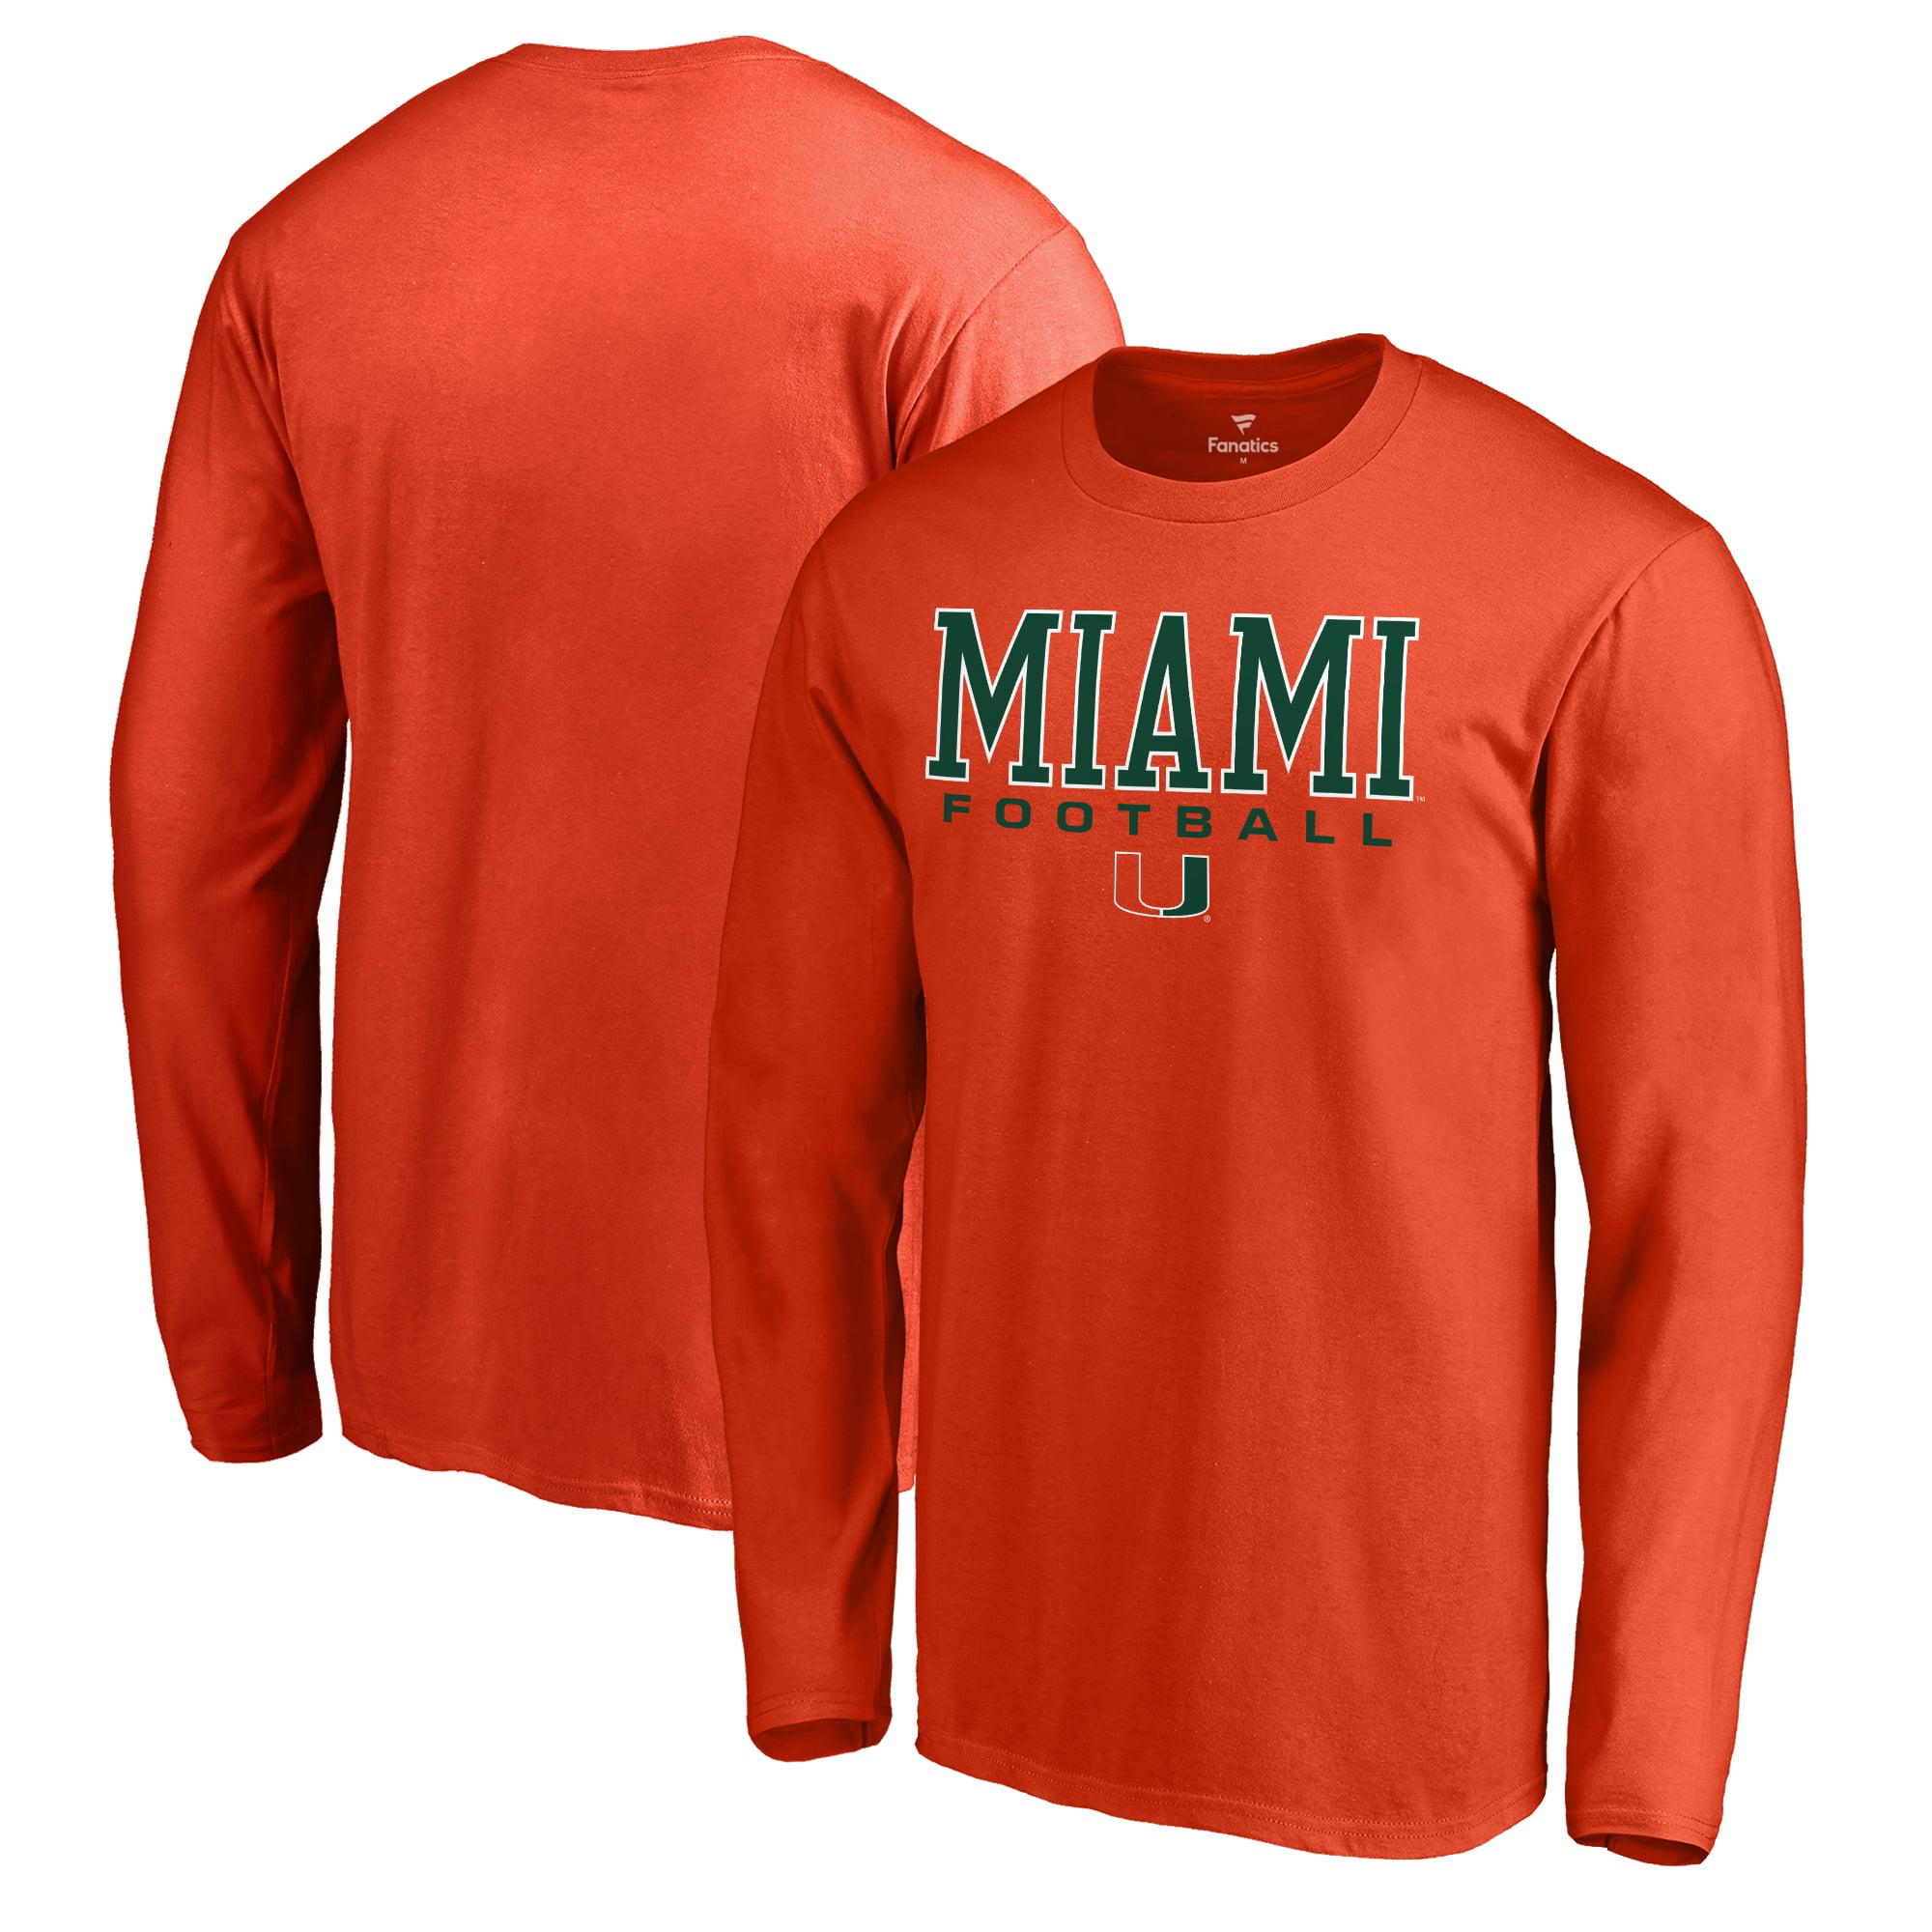 97c9bc2c0ae Miami Hurricanes Fanatics Branded True Sport Football Long Sleeve T-Shirt -  Orange